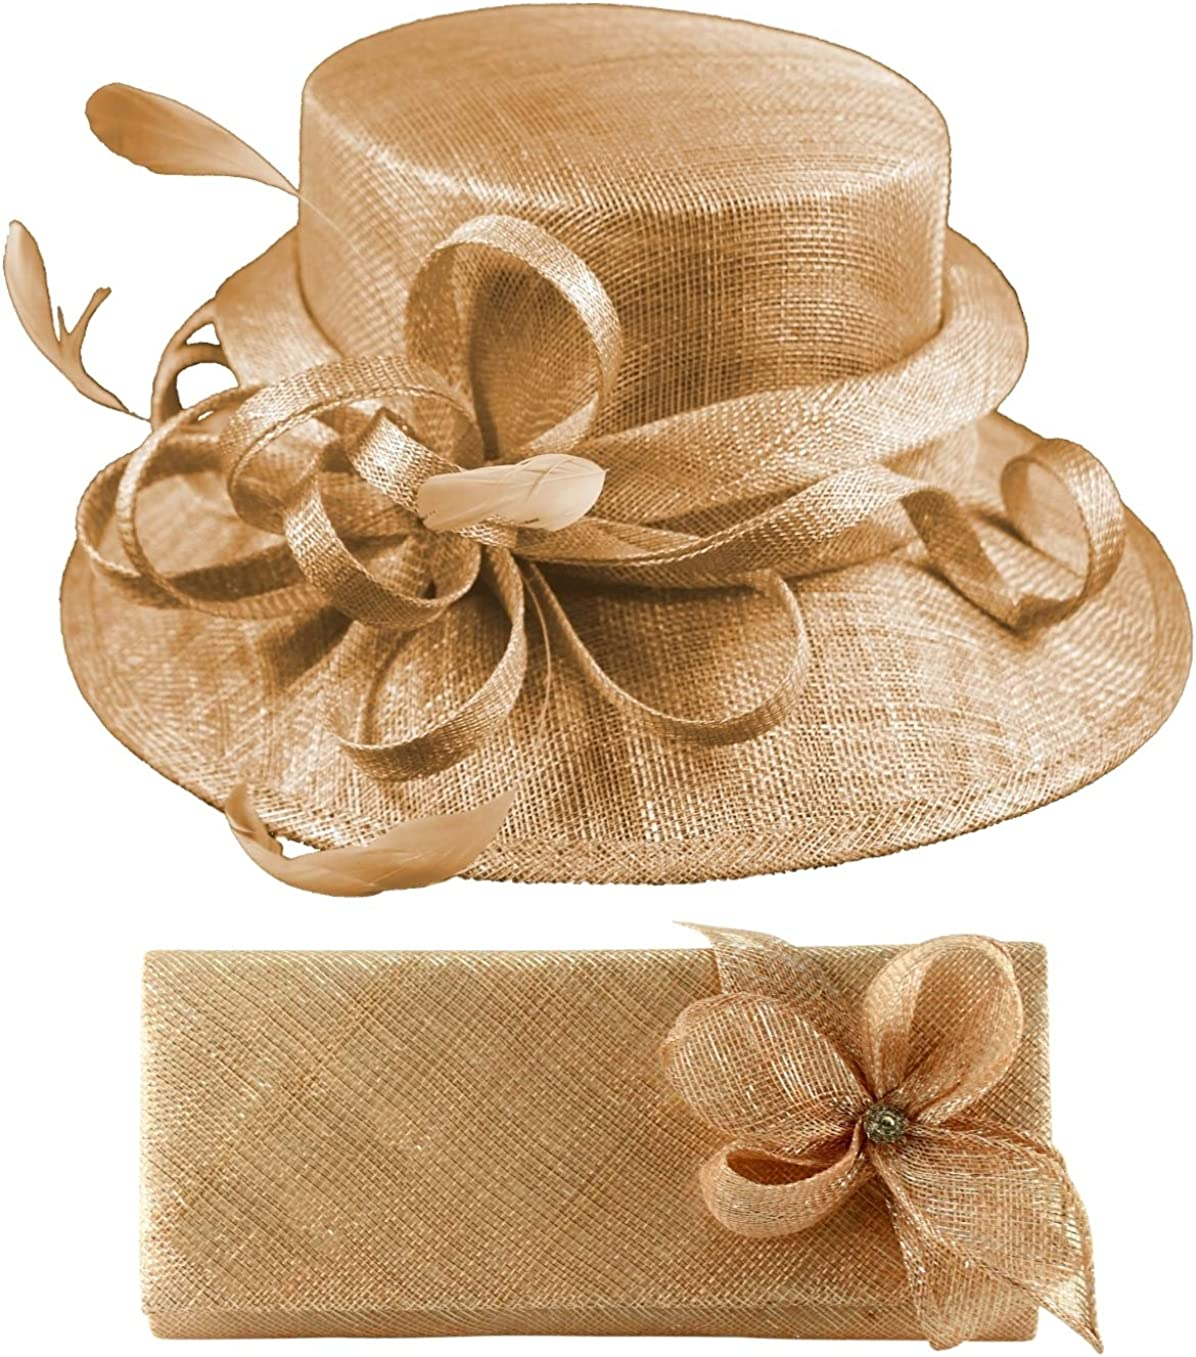 Elegance Collection Sinamay Wedding Hat Bundle with Matching Sinamay Bag (2 Items)